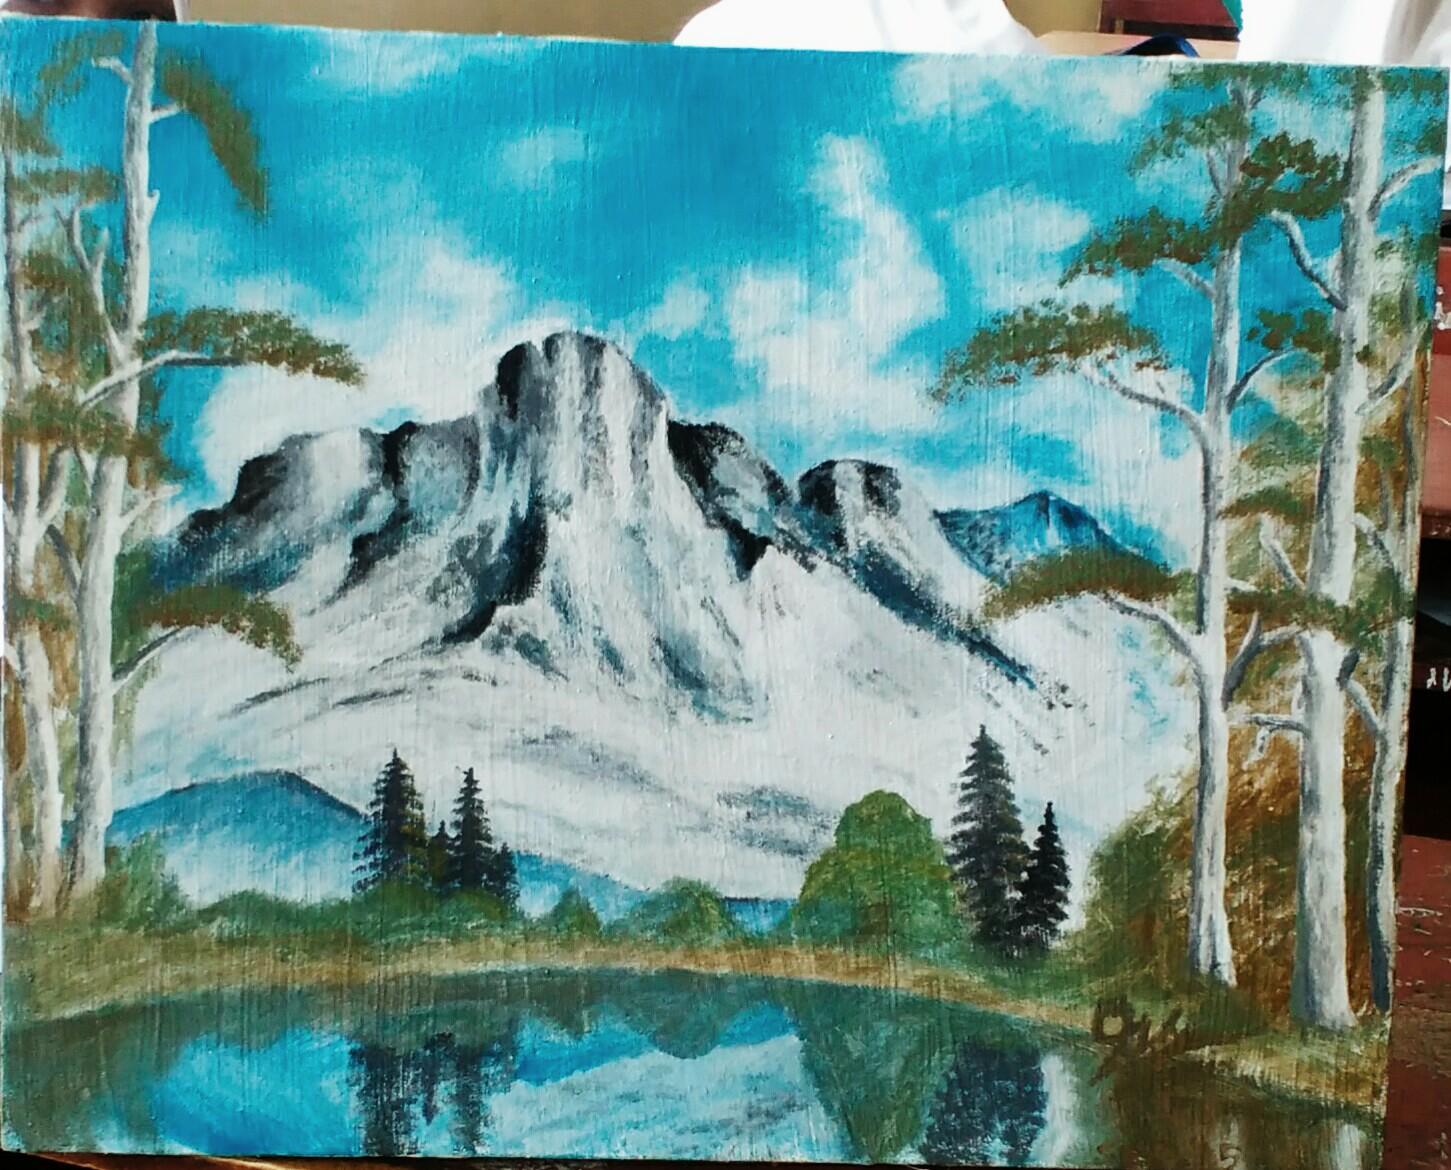 Sketsa Gambar Pemandangan Di Kanvas